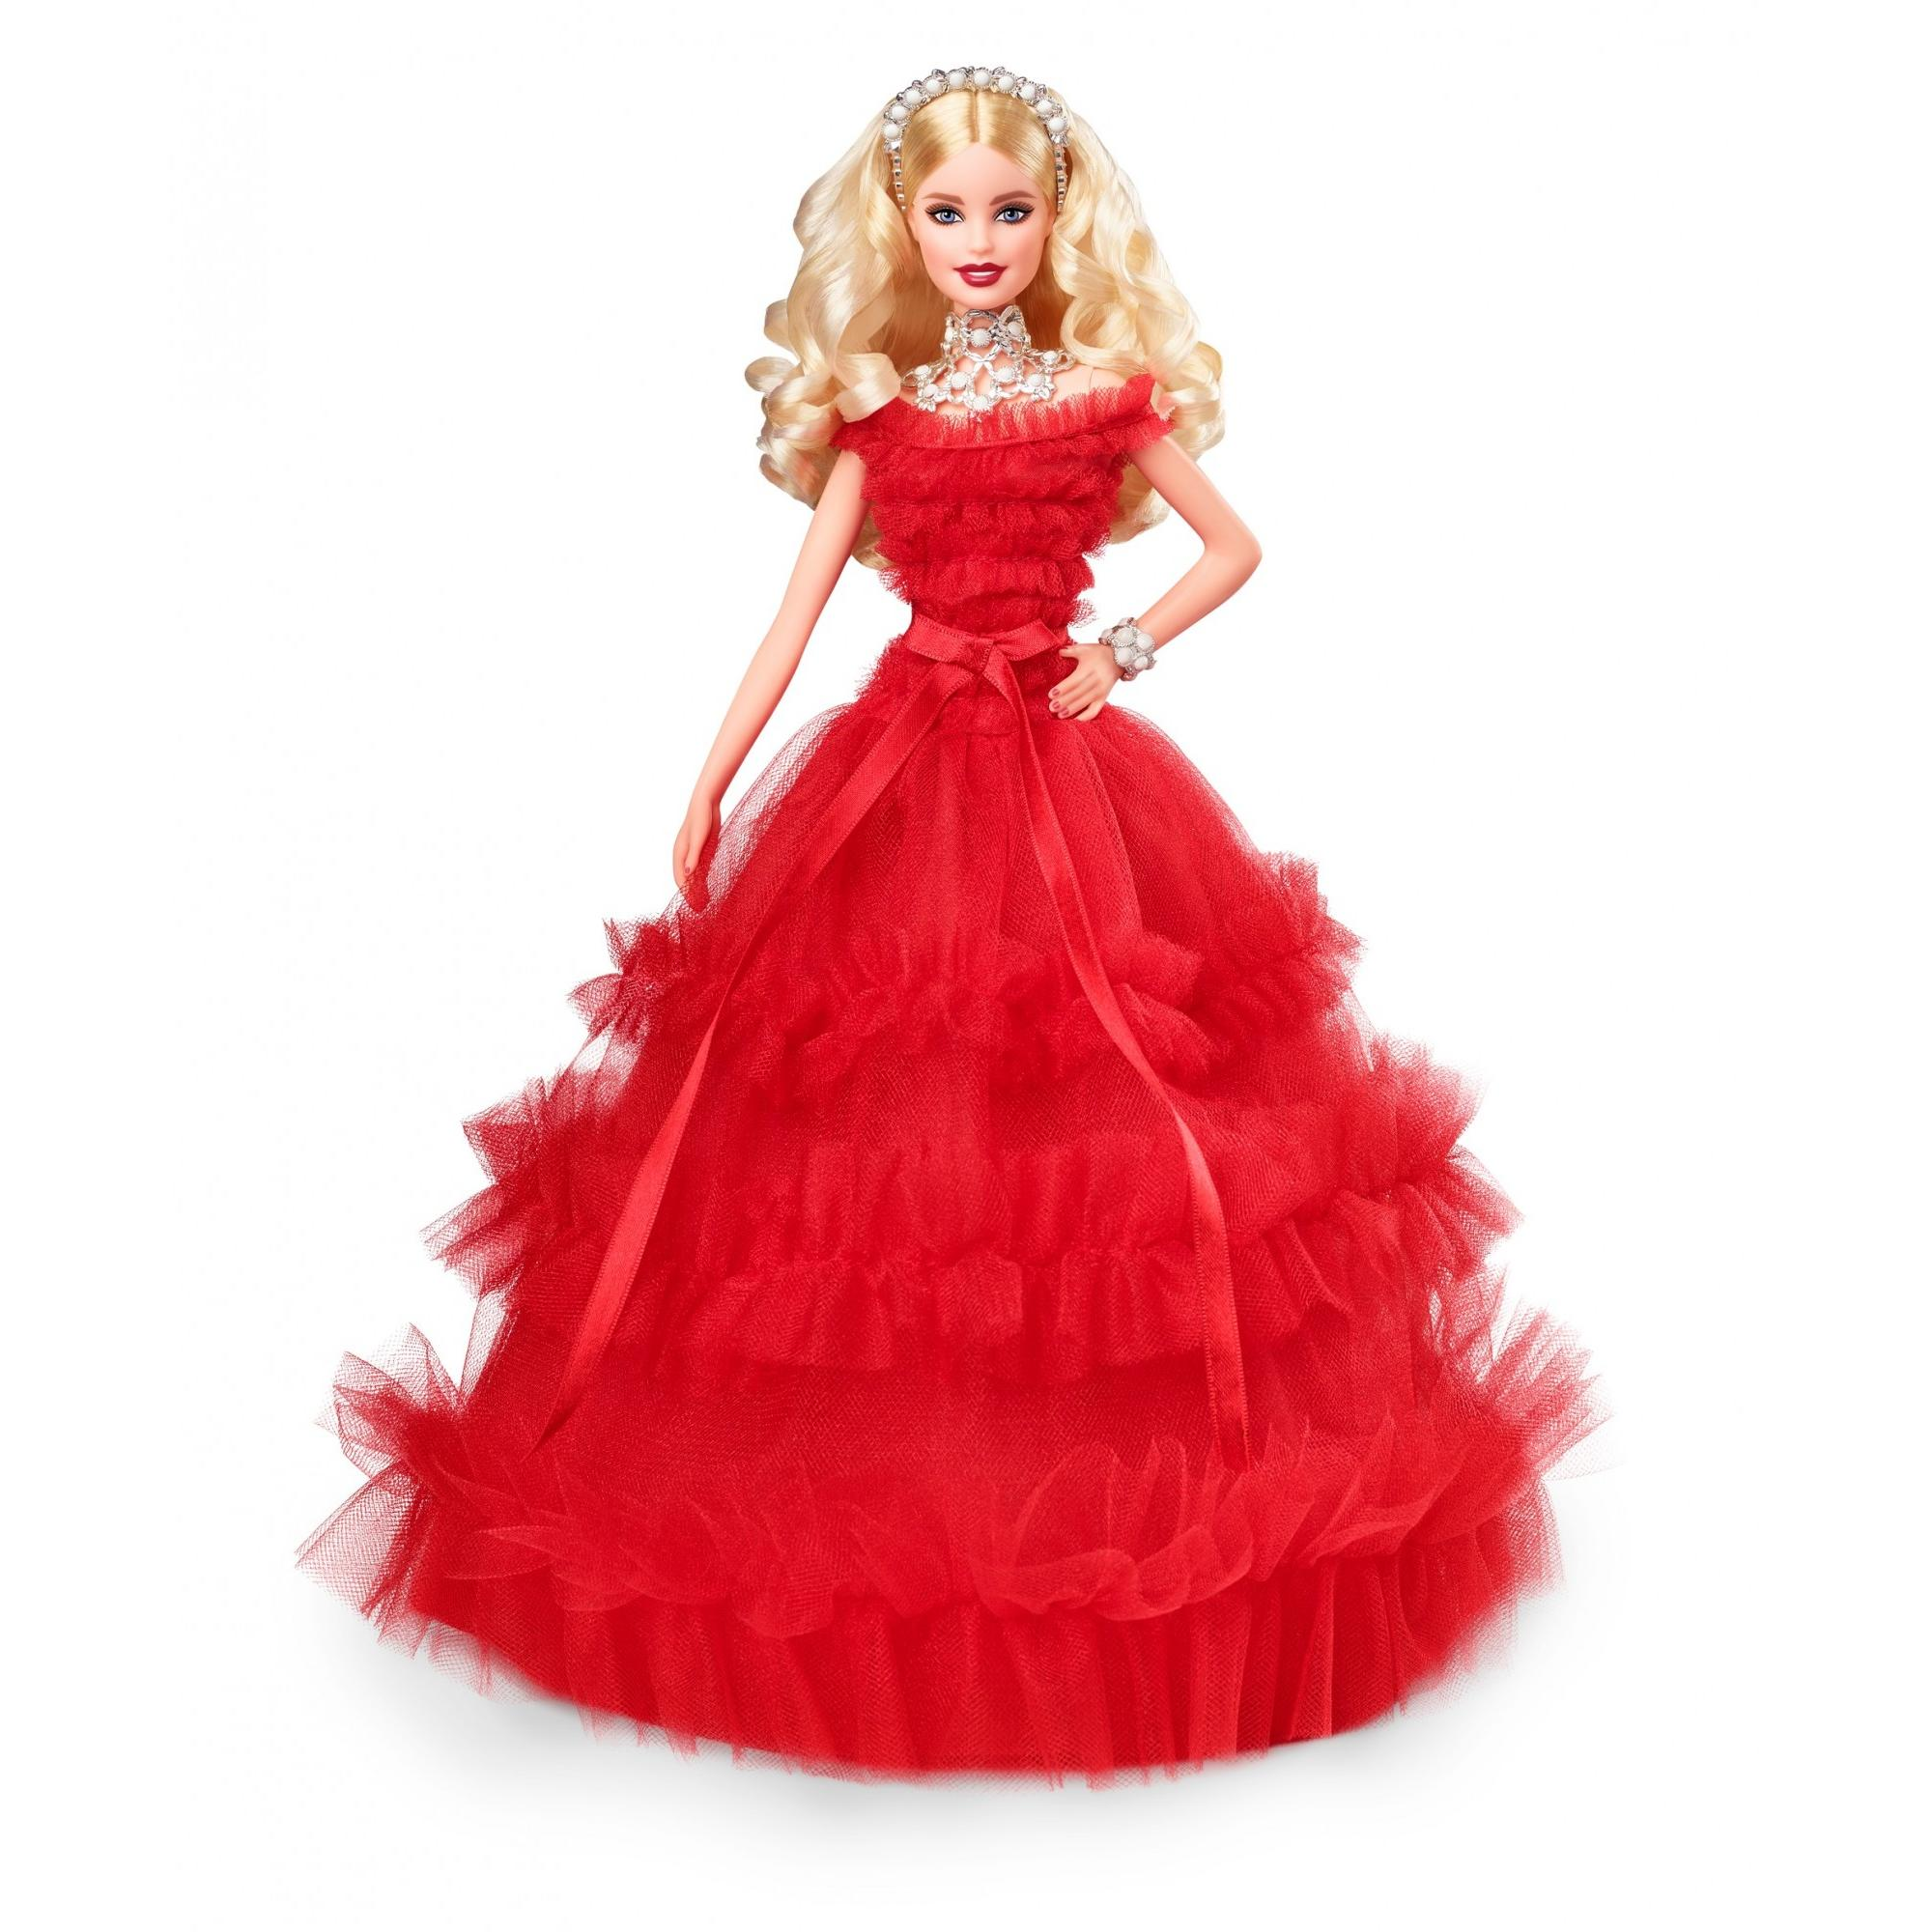 76ca0bd1364 Barbie Dolls - Walmart.com